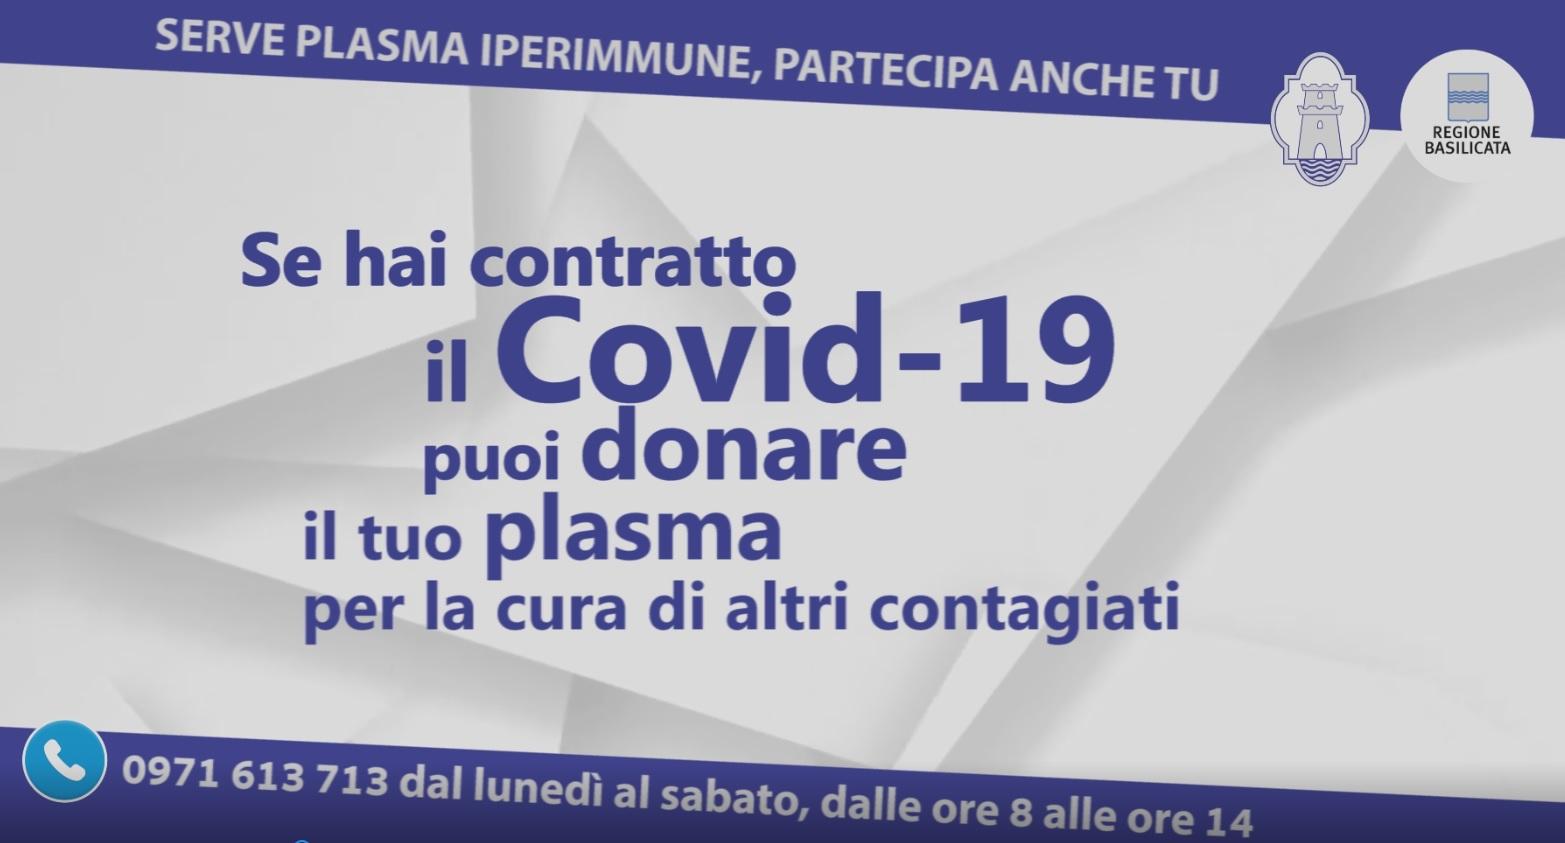 dona_plasma_covid-19